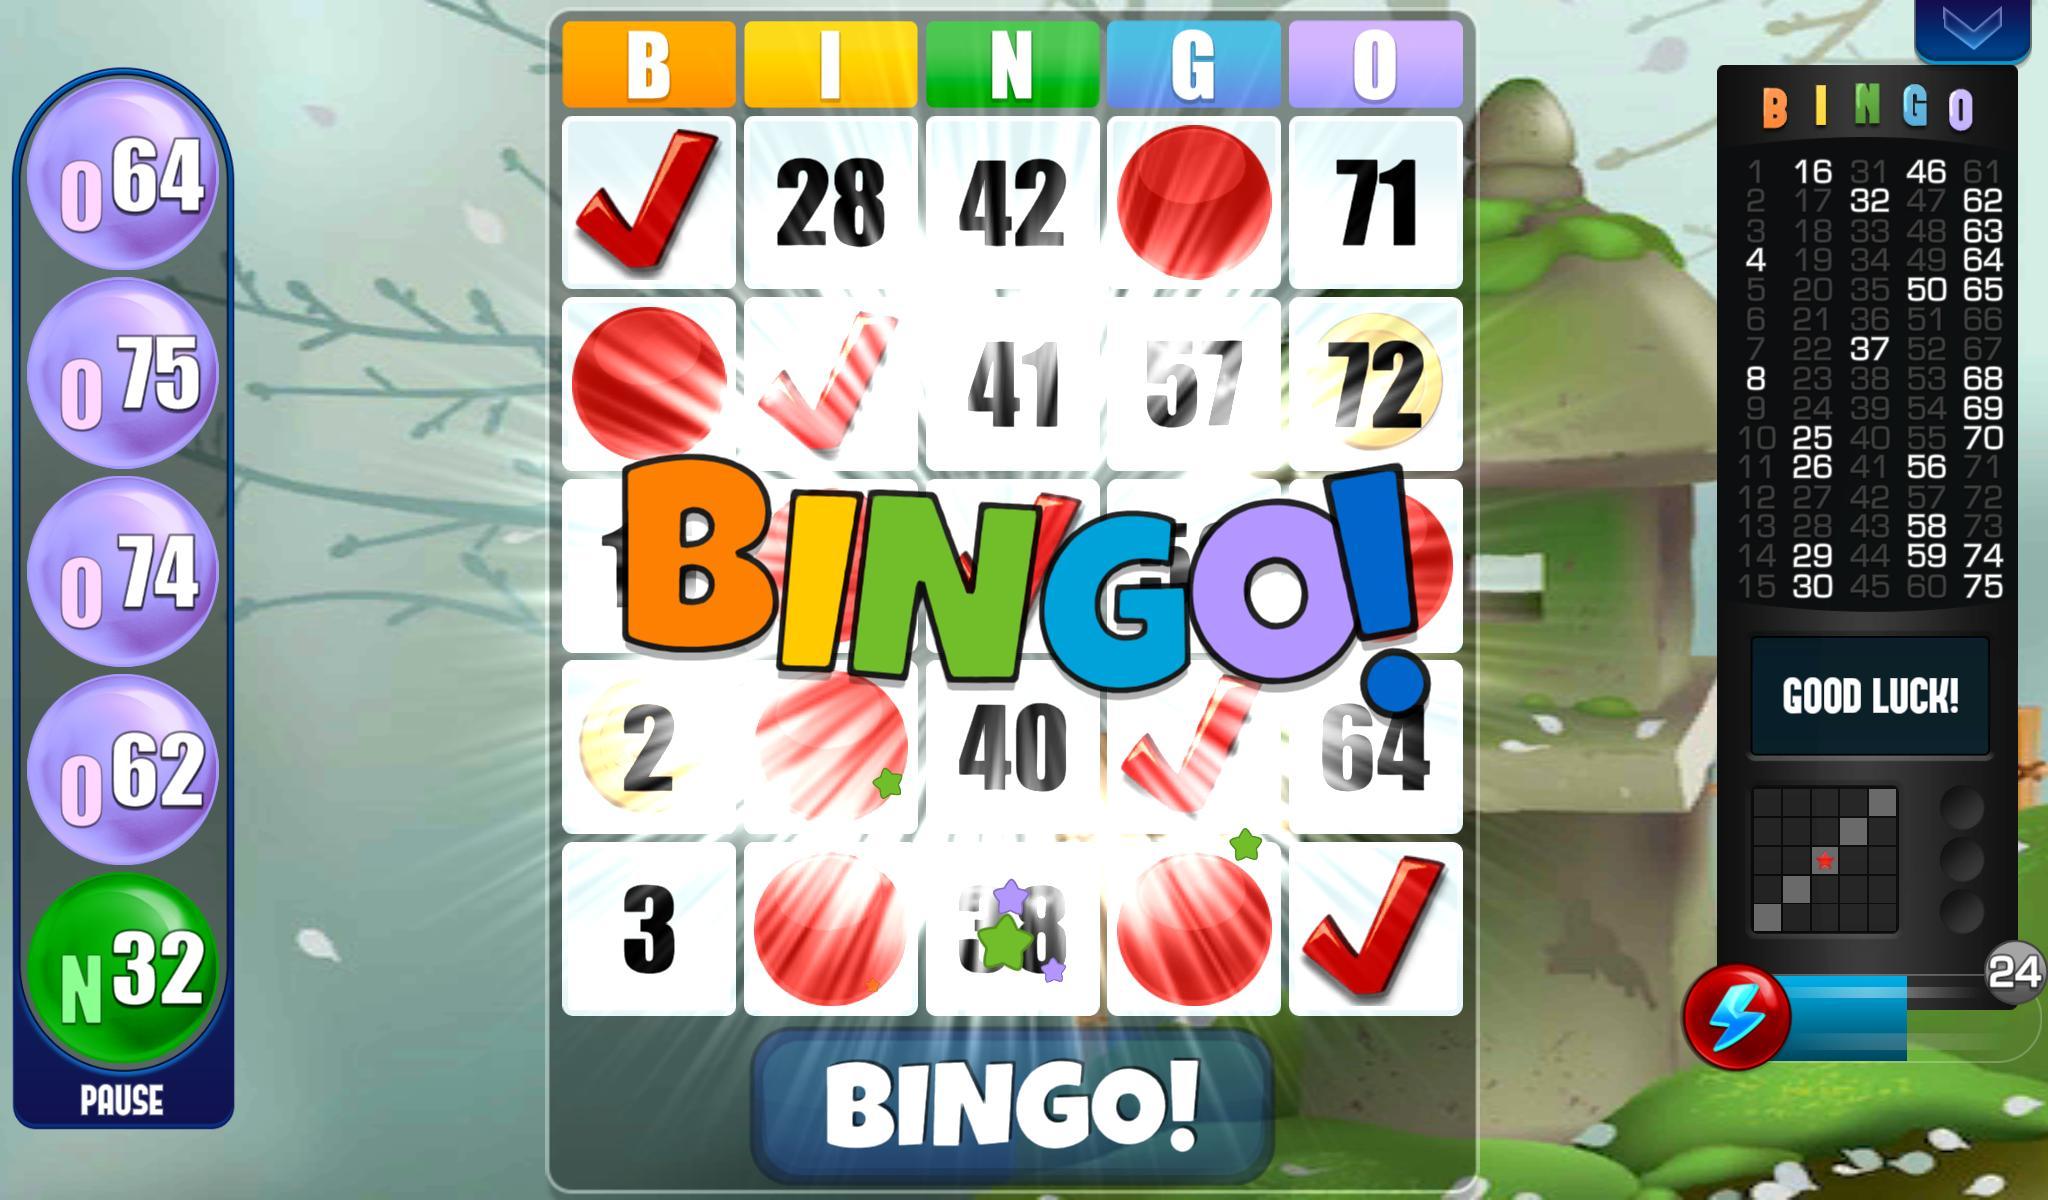 Download Free Bingo Games To My Phone